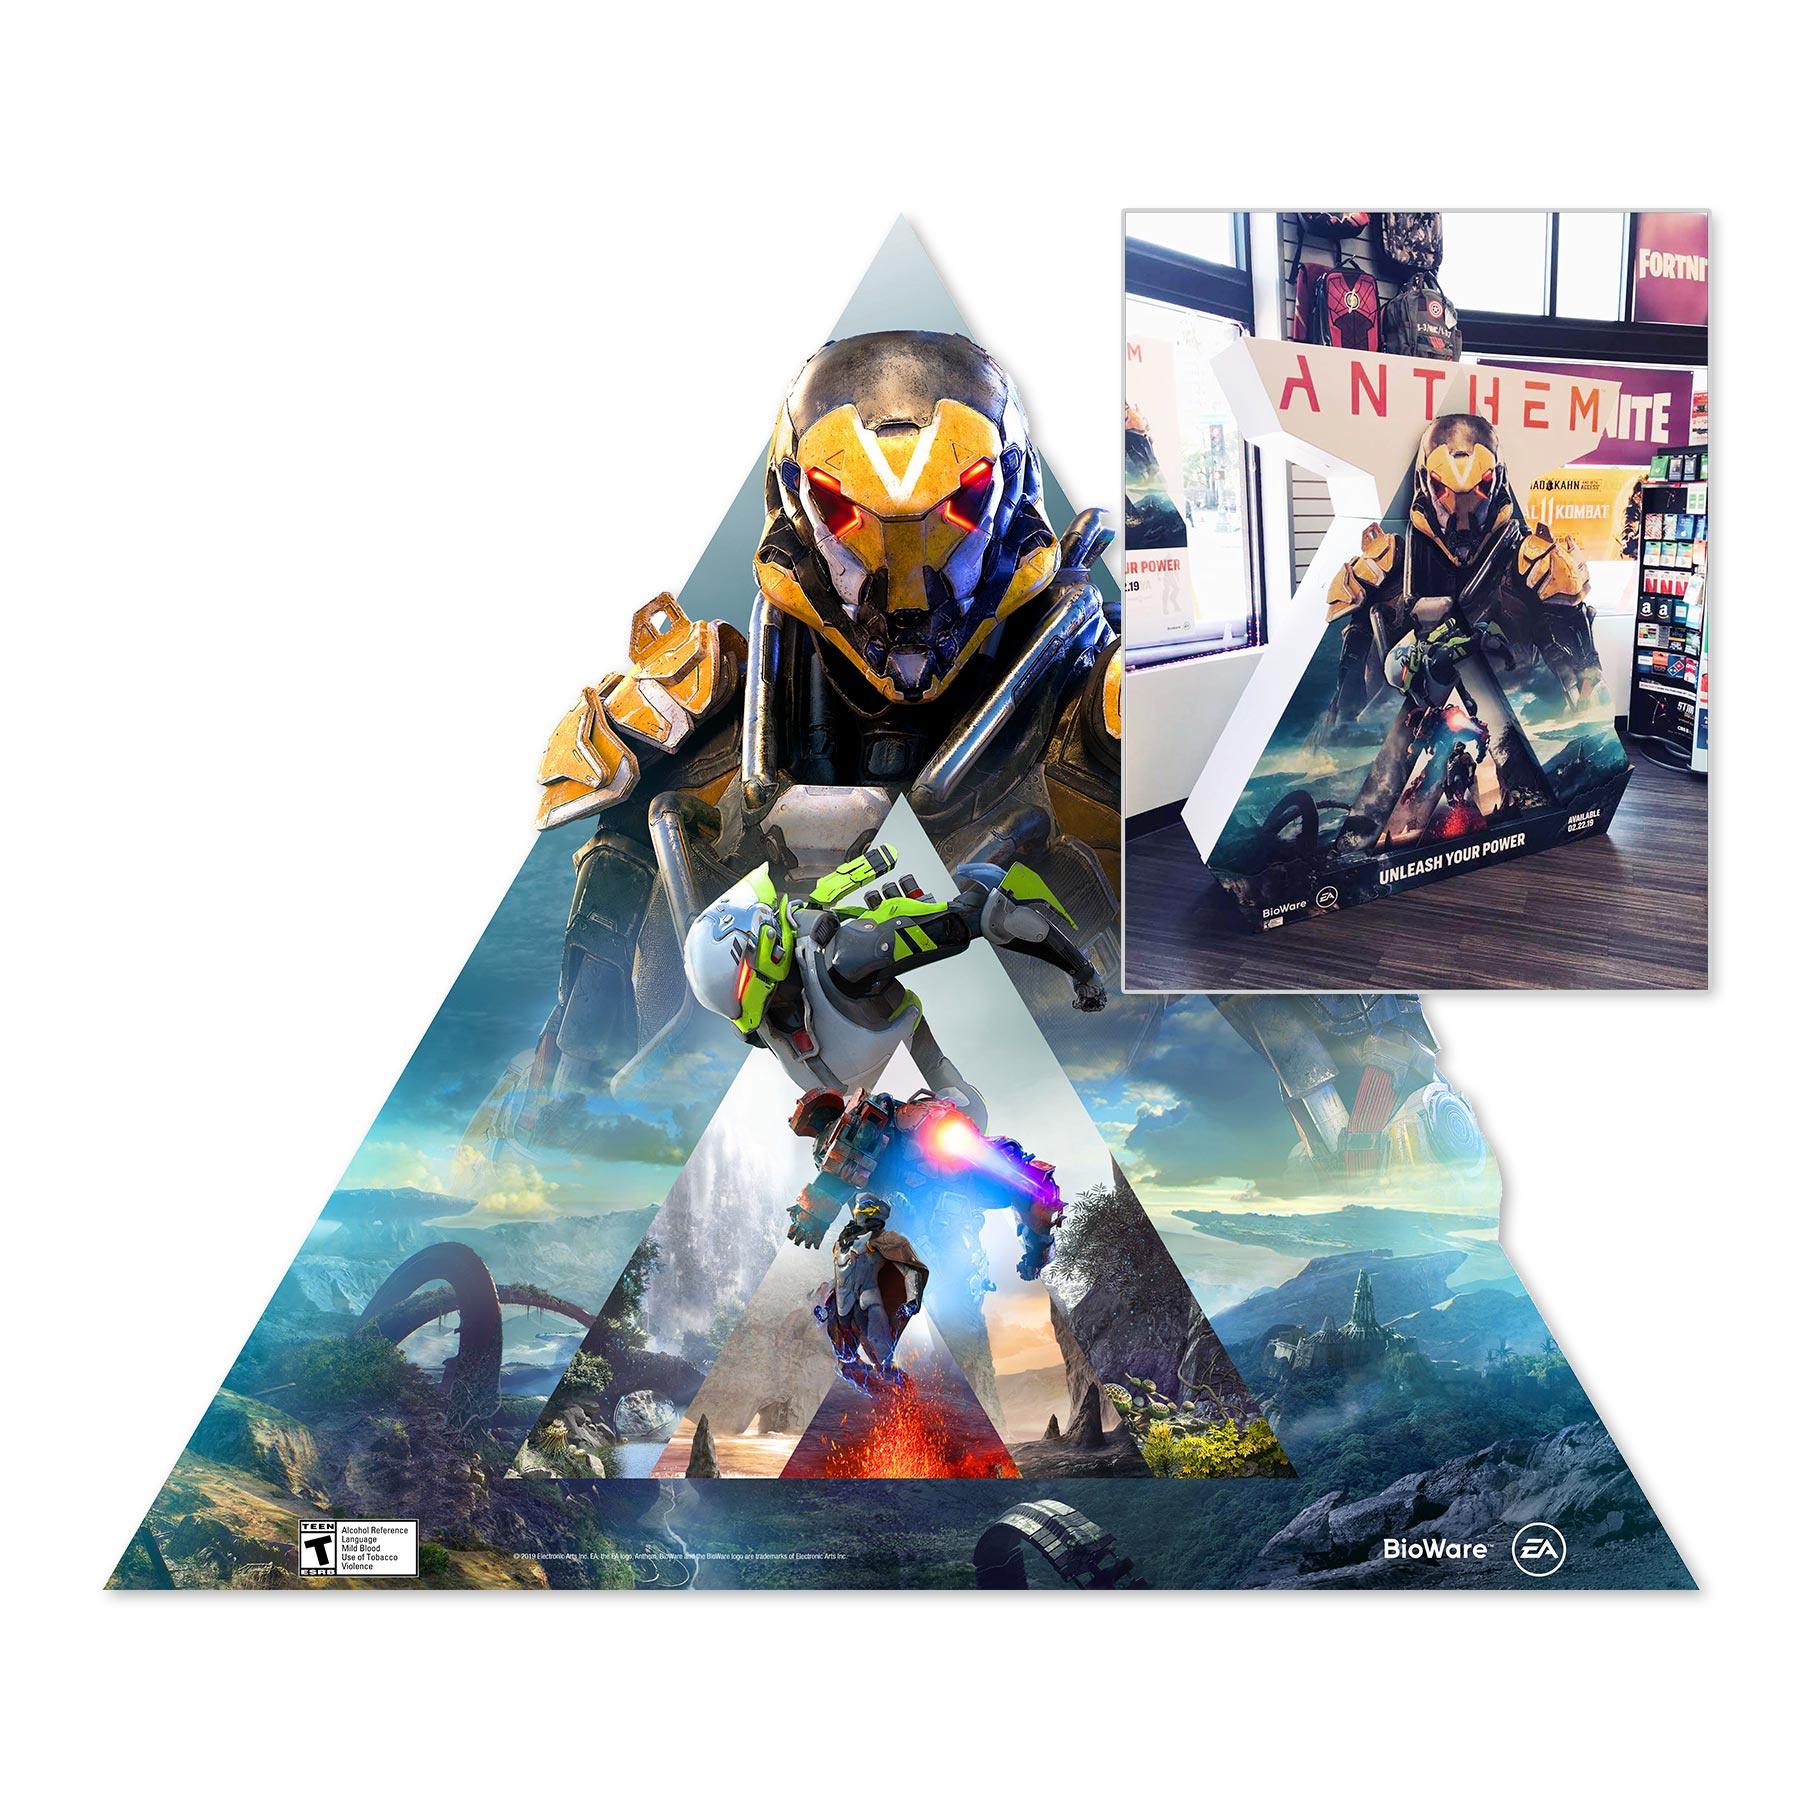 Anthem GameStop Display